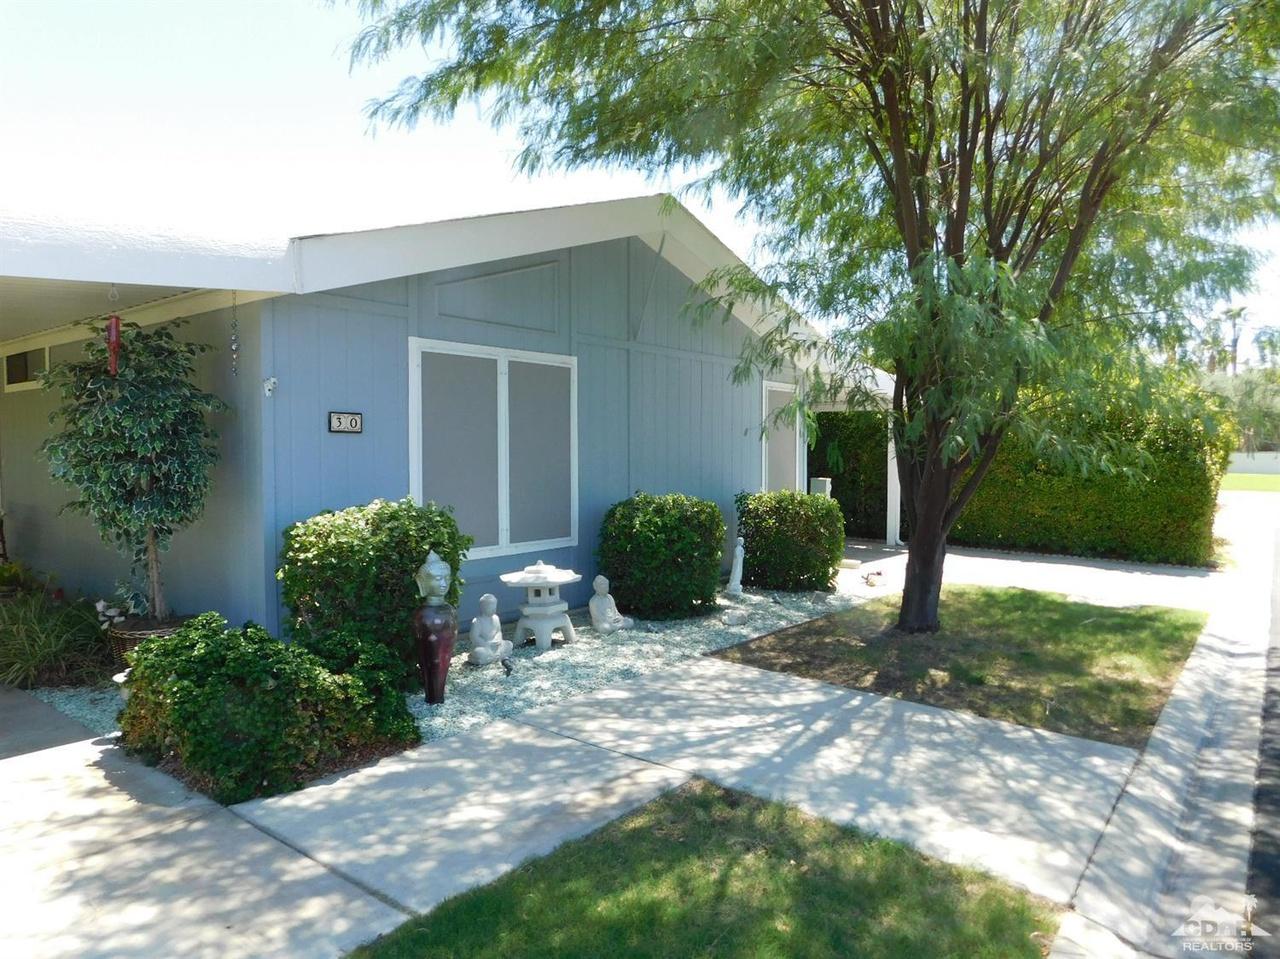 73450 Country Club Dr #30, Palm Desert, CA 92260 | MLS# 217022092 ...